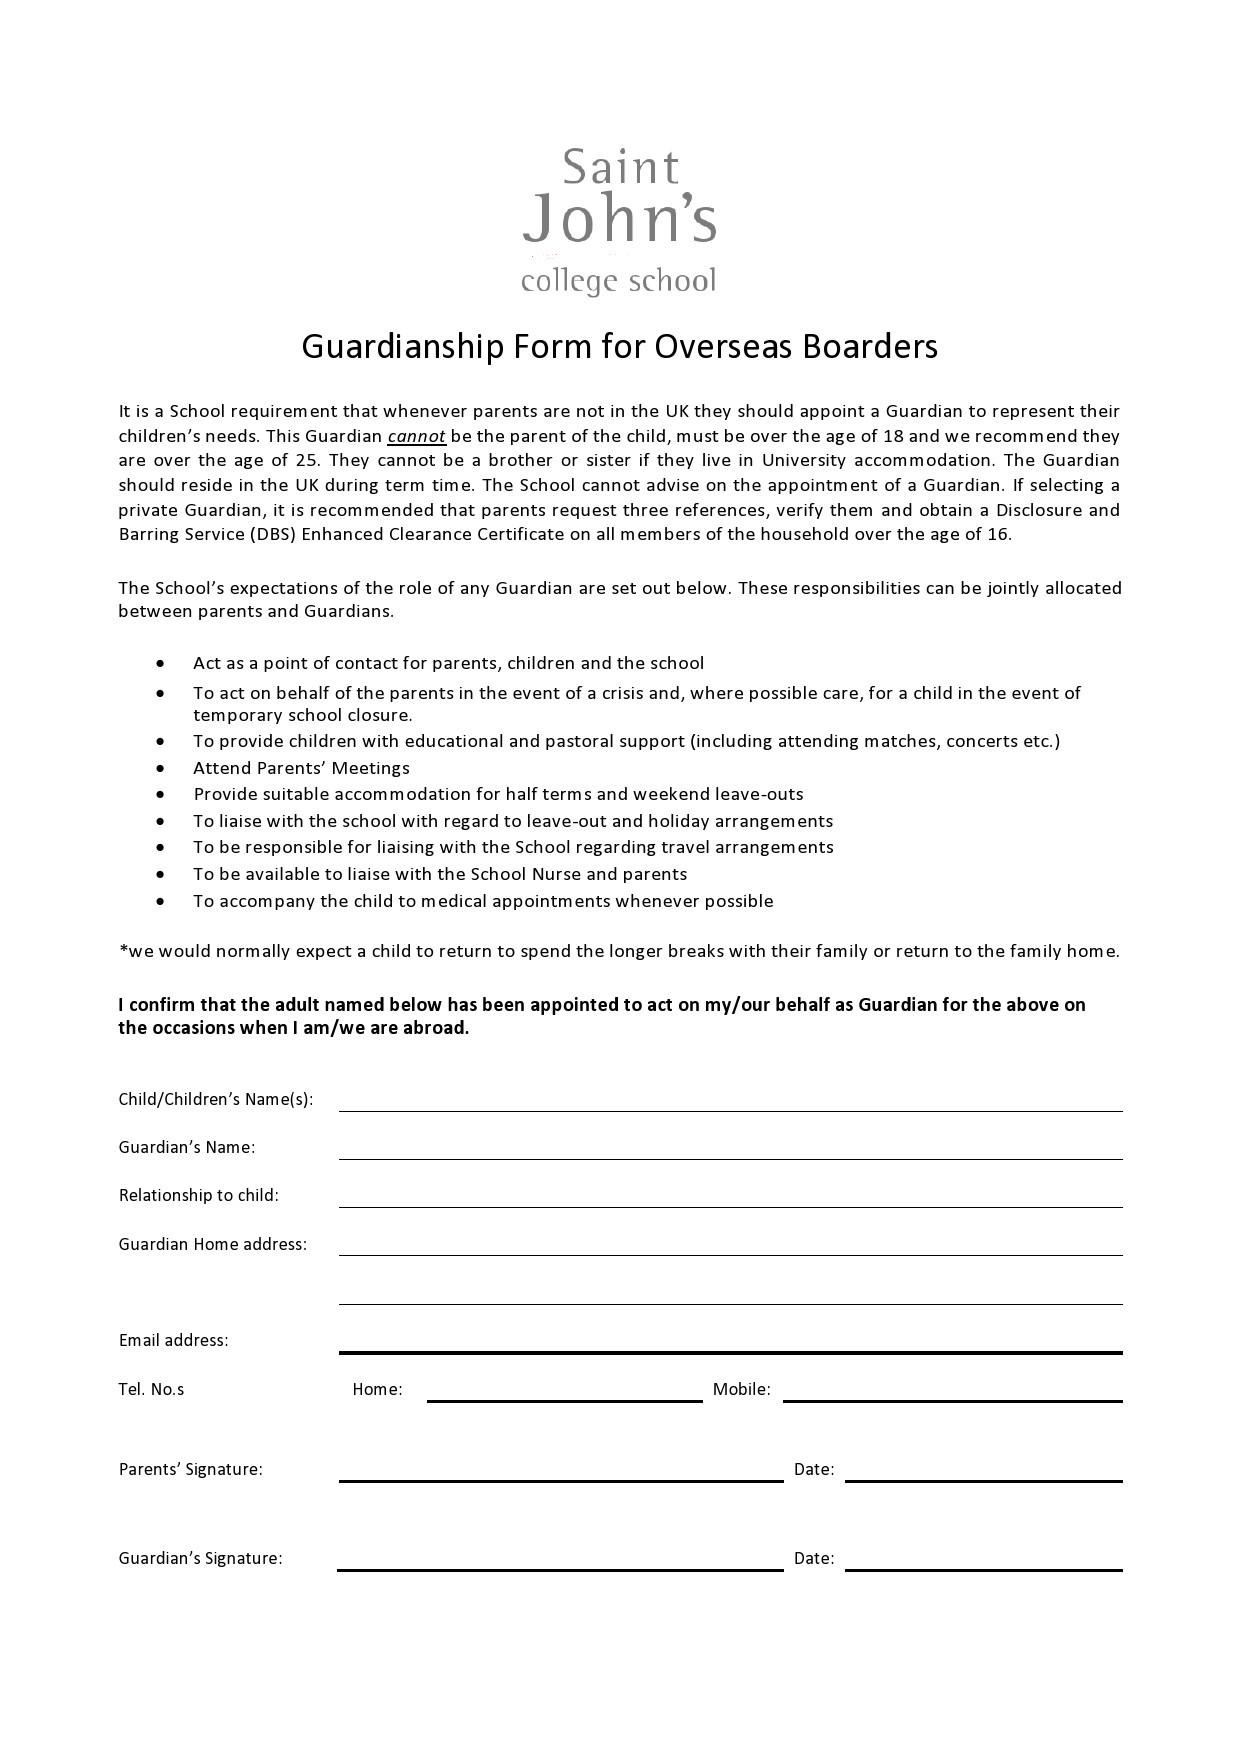 Free guardianship form 35